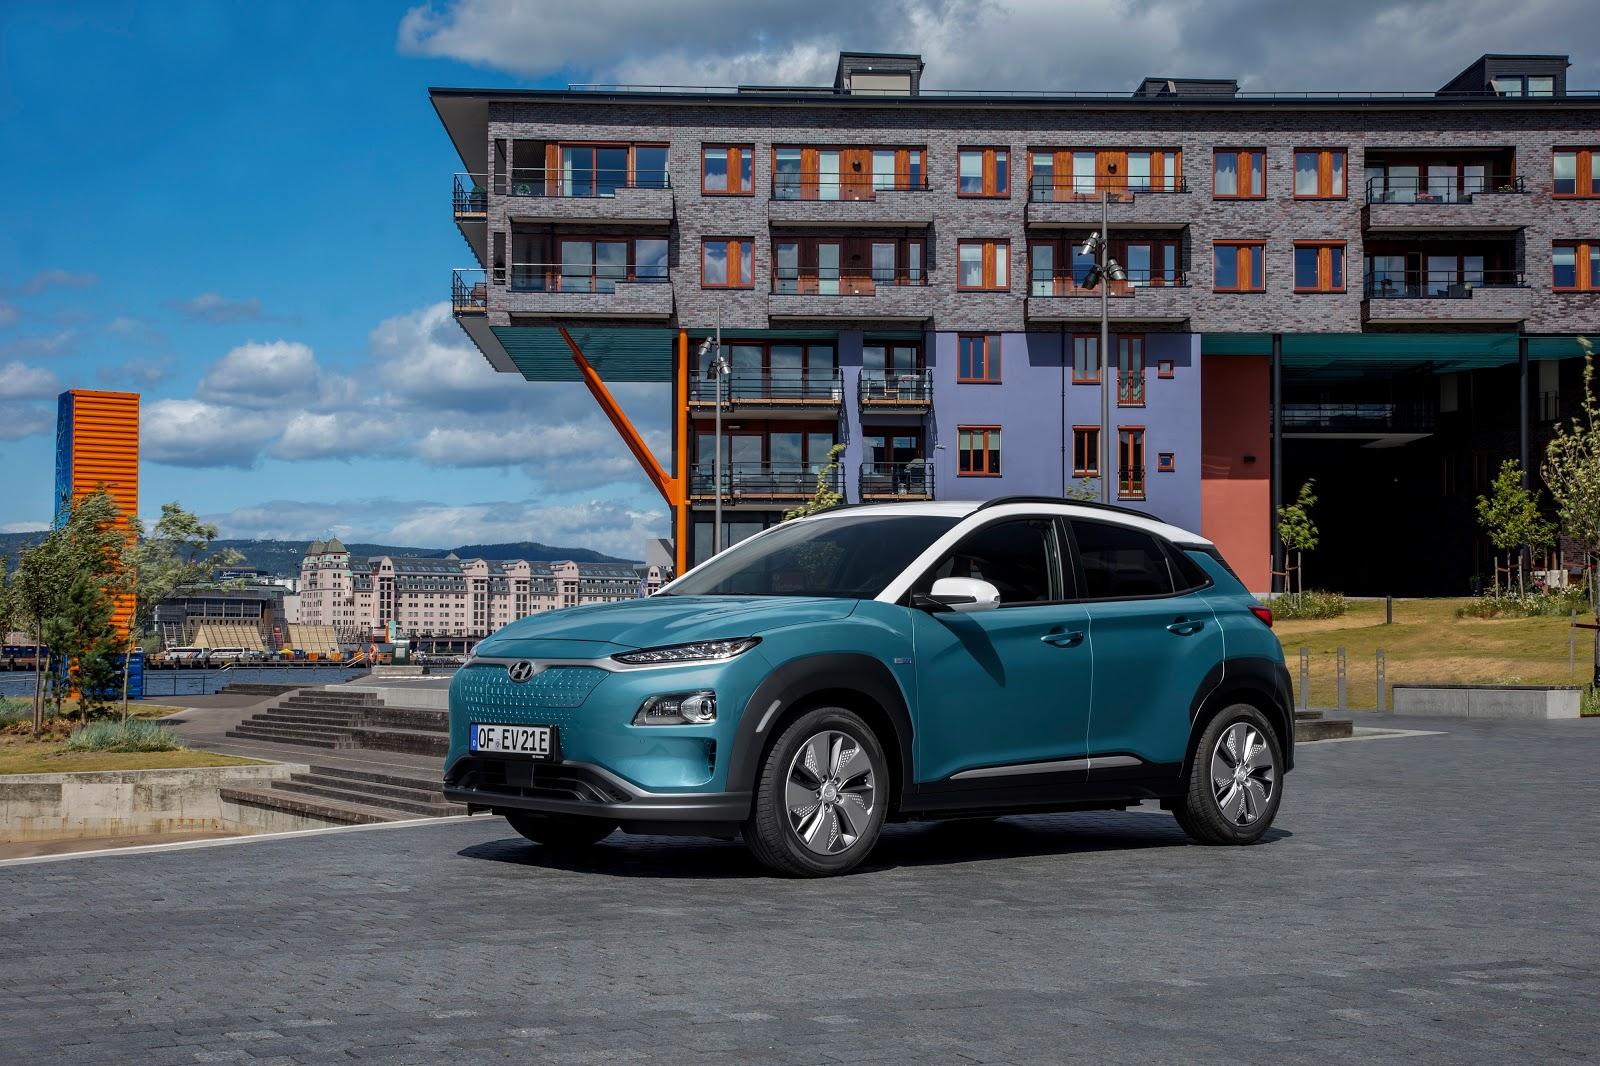 Kona2BElectric Η Hyundai, ιδρύει Παγκόσμιο Κέντρο Καινοτομίας Κινητικότητας AI, Electric cars, electric vehicles, Hyundai, ειδήσεις, καινοτομία, καινούργιο, καινούρια, καινούριο